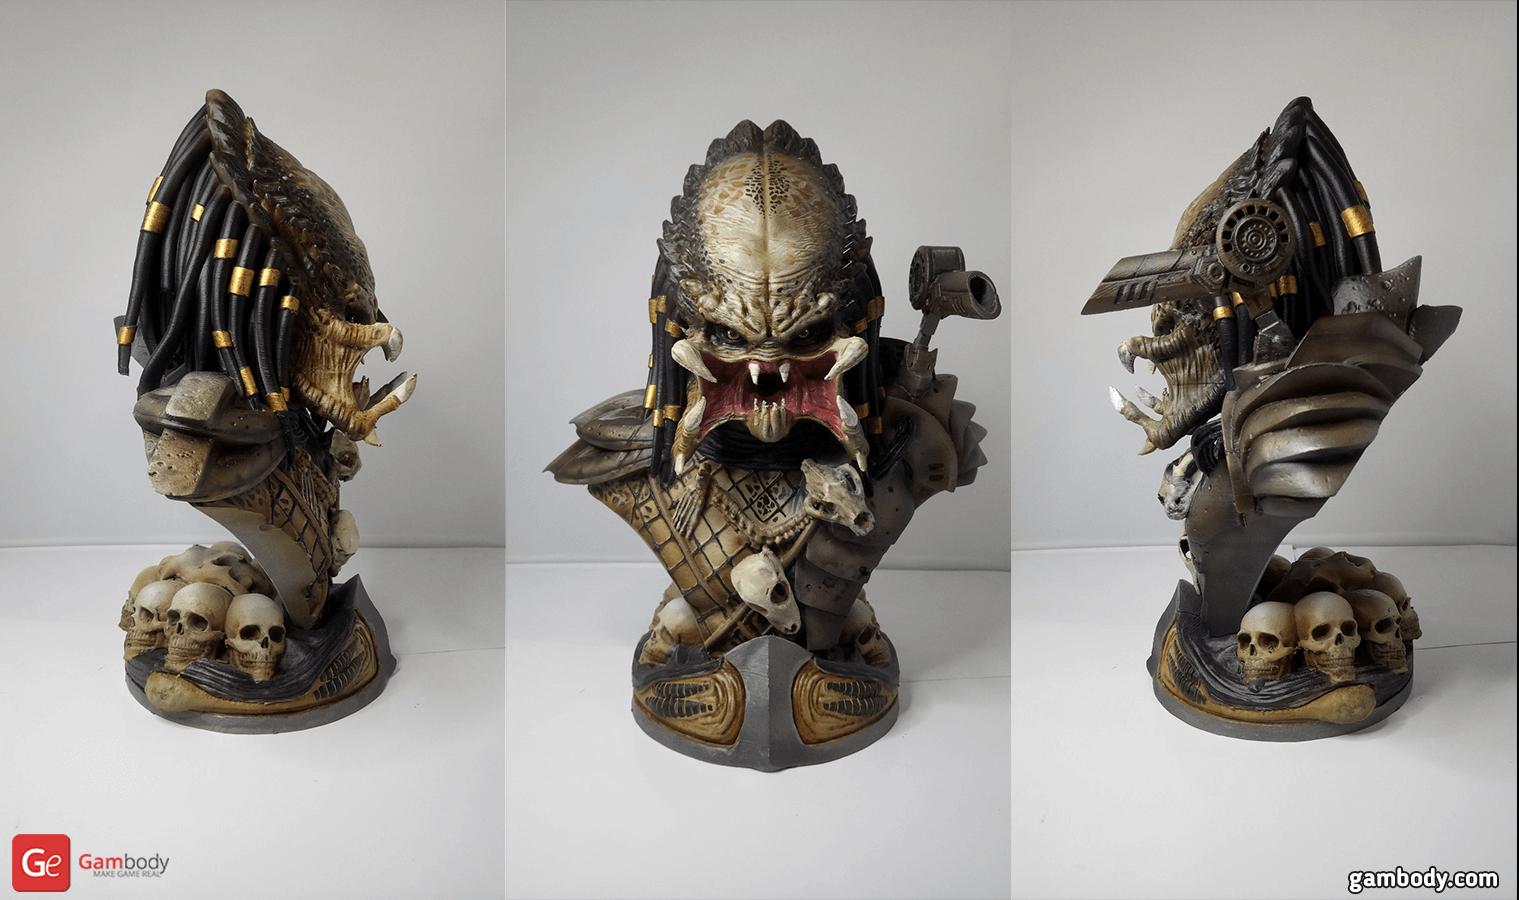 Predator Bust 3D Printing Figurine